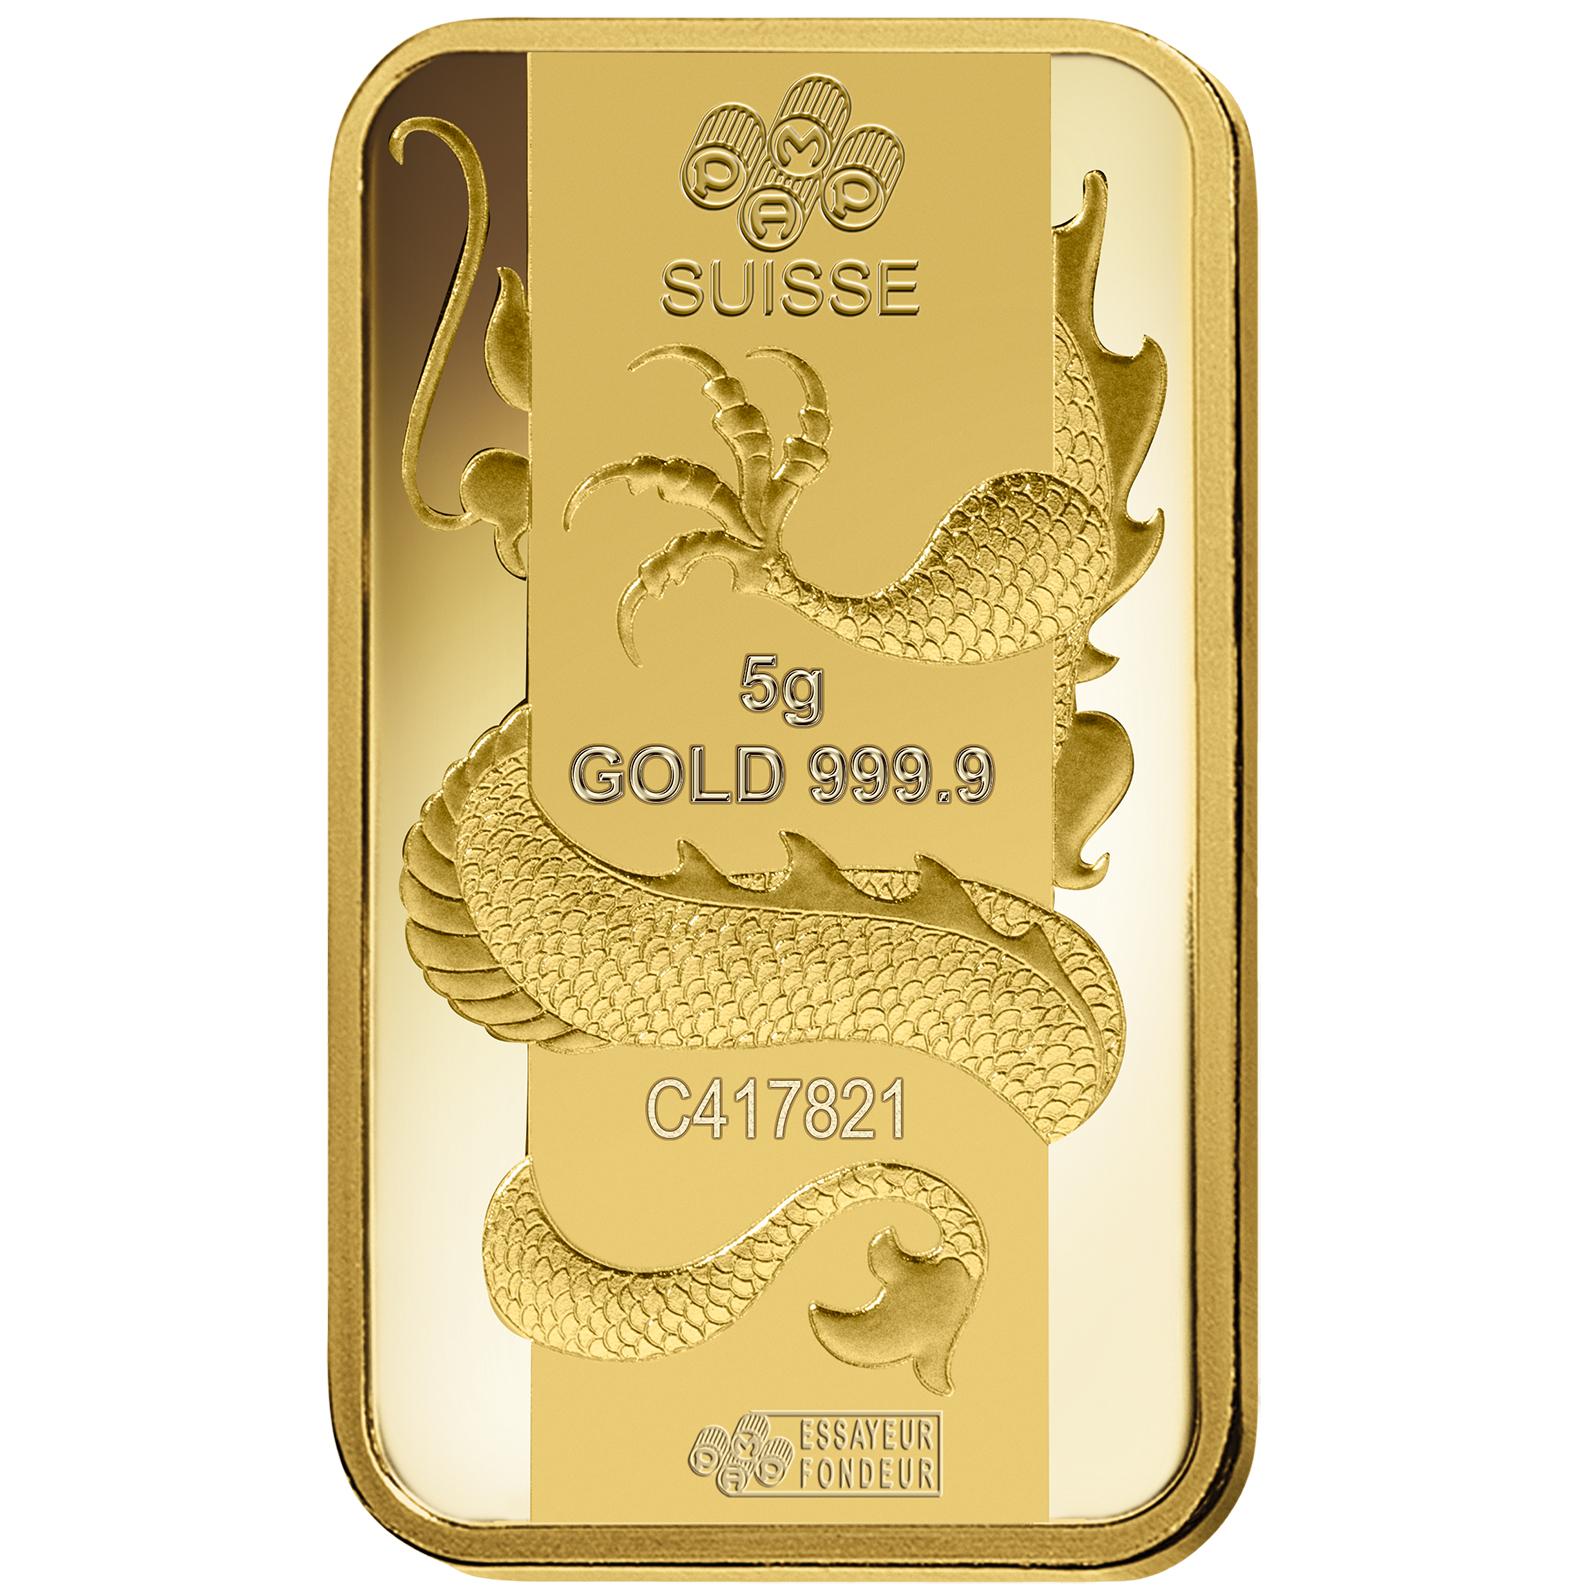 5 grammi lingottino d'oro puro 999.9 - PAMP Suisse Lunar Drago